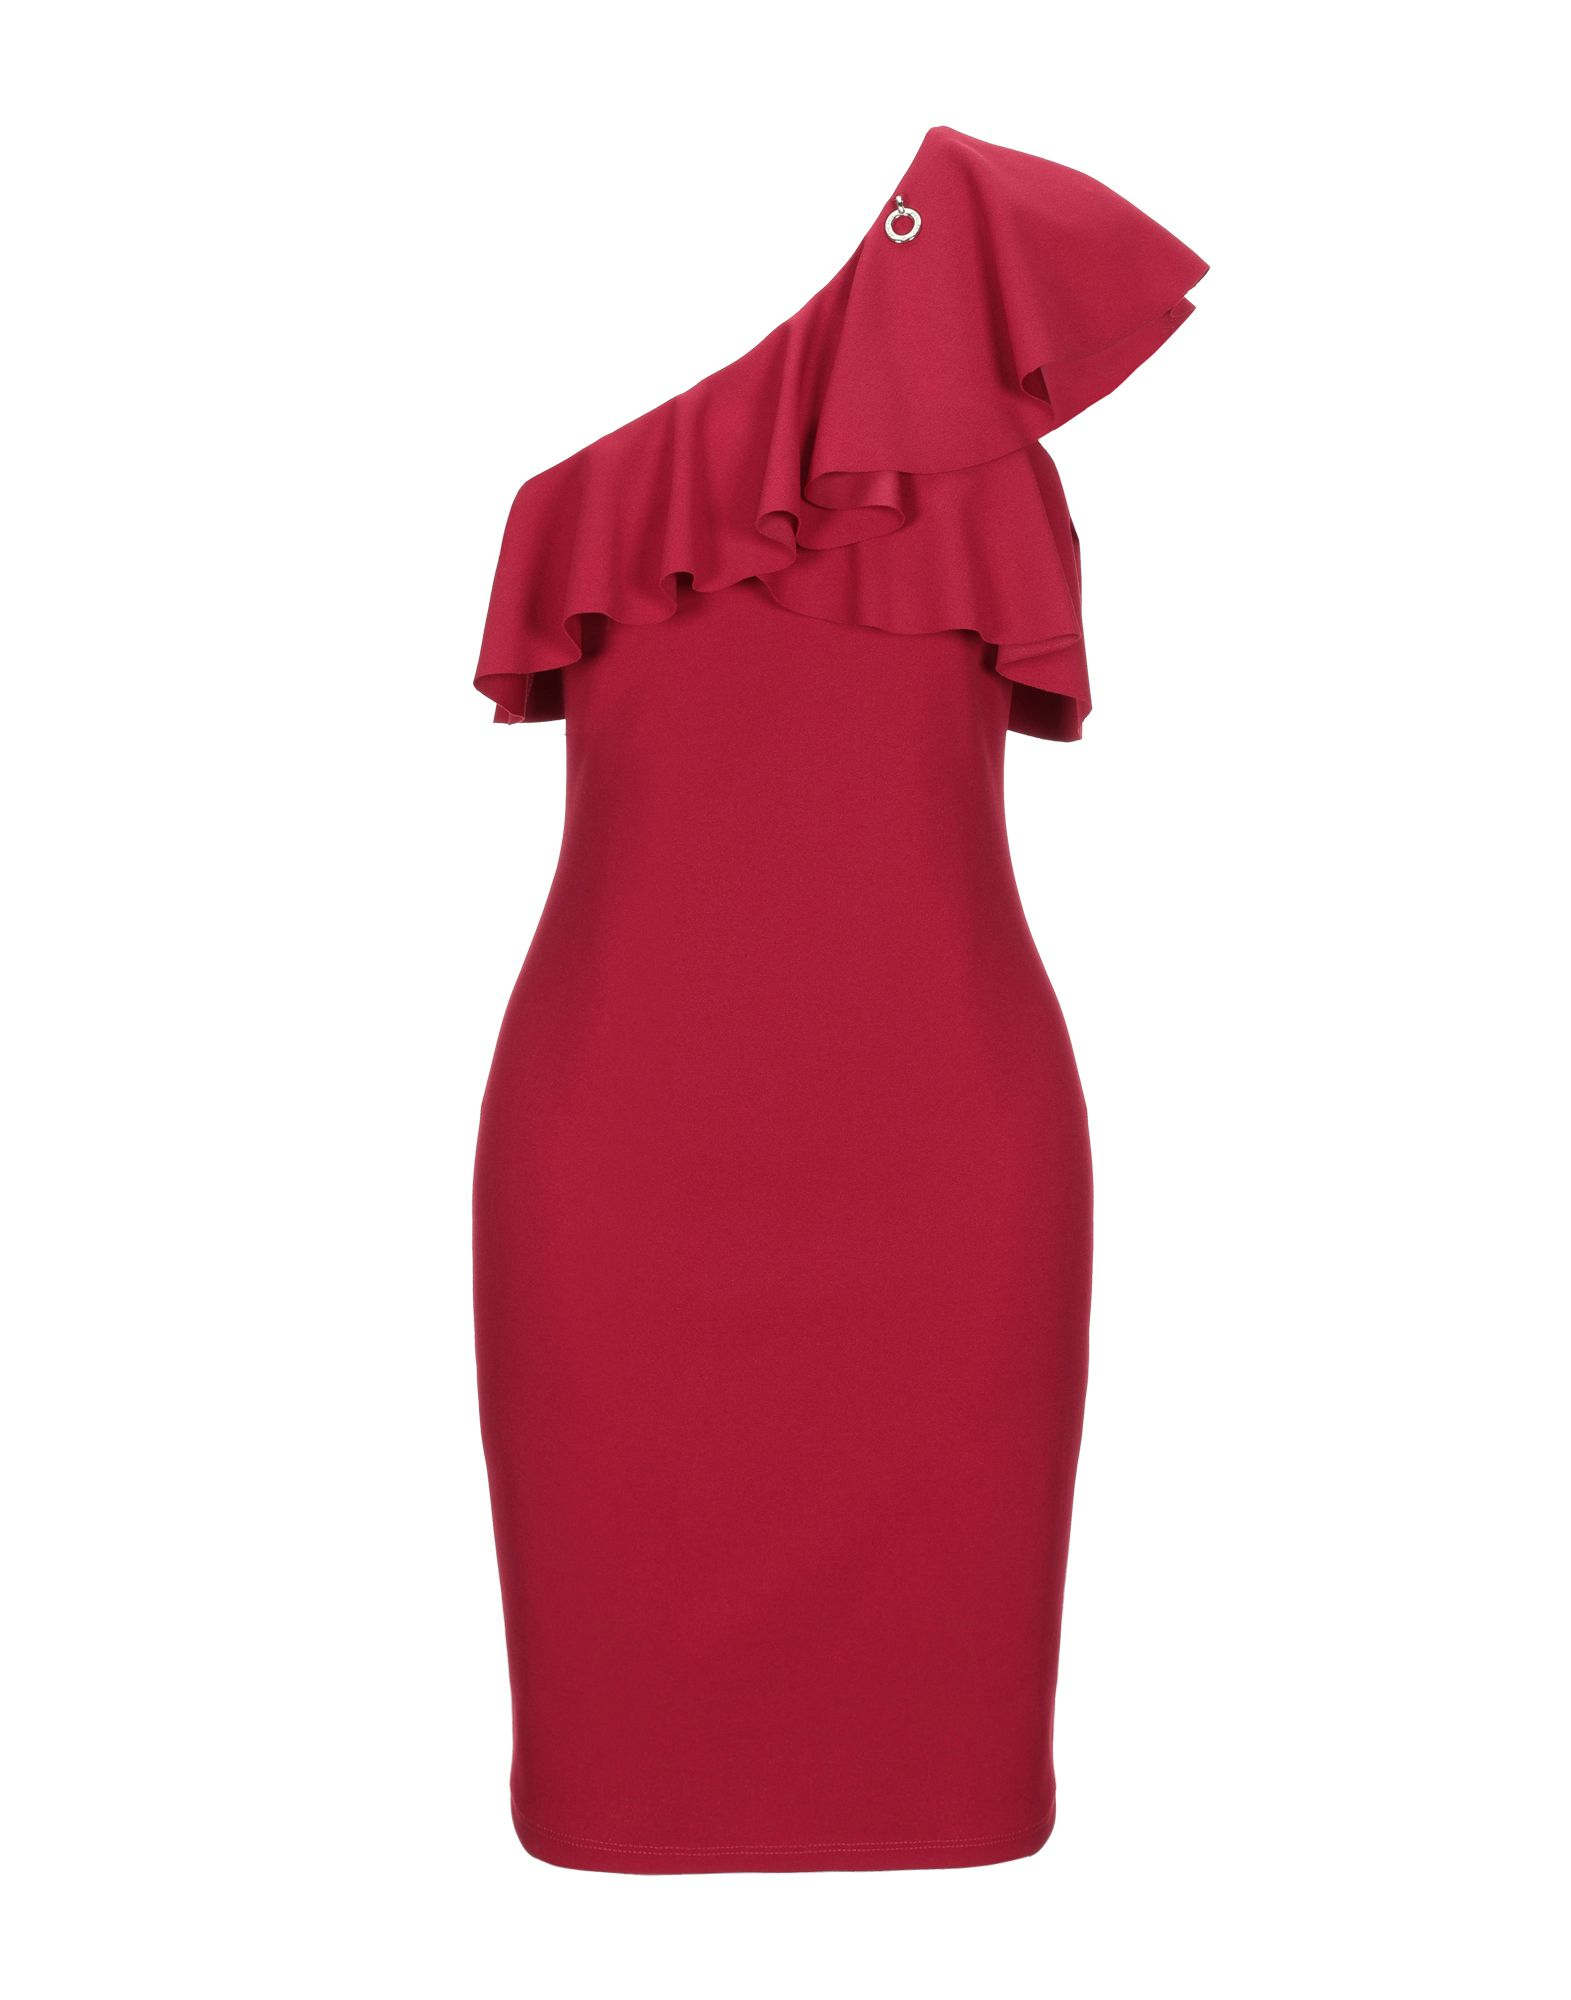 MANGANO Короткое платье платье коктейльное из одно плечо